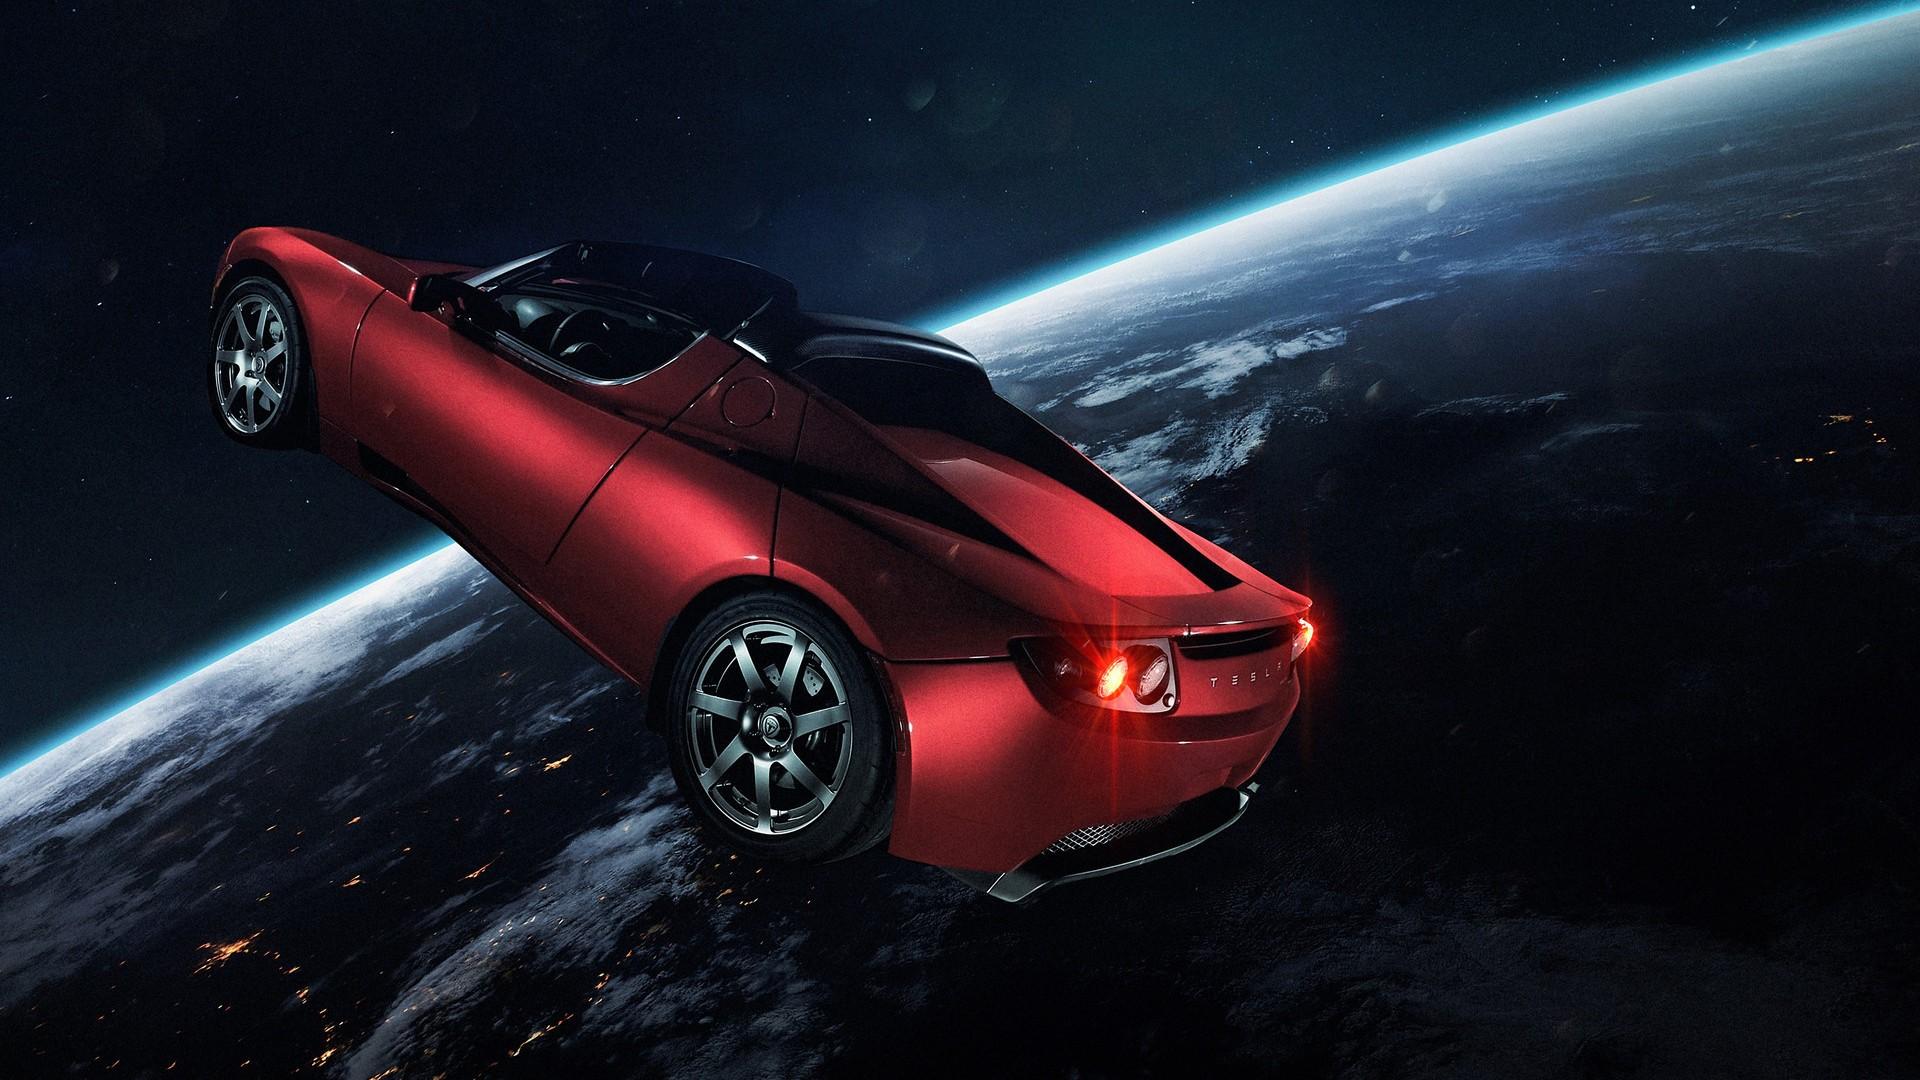 Tesla Roadster Samsung Wallpapers